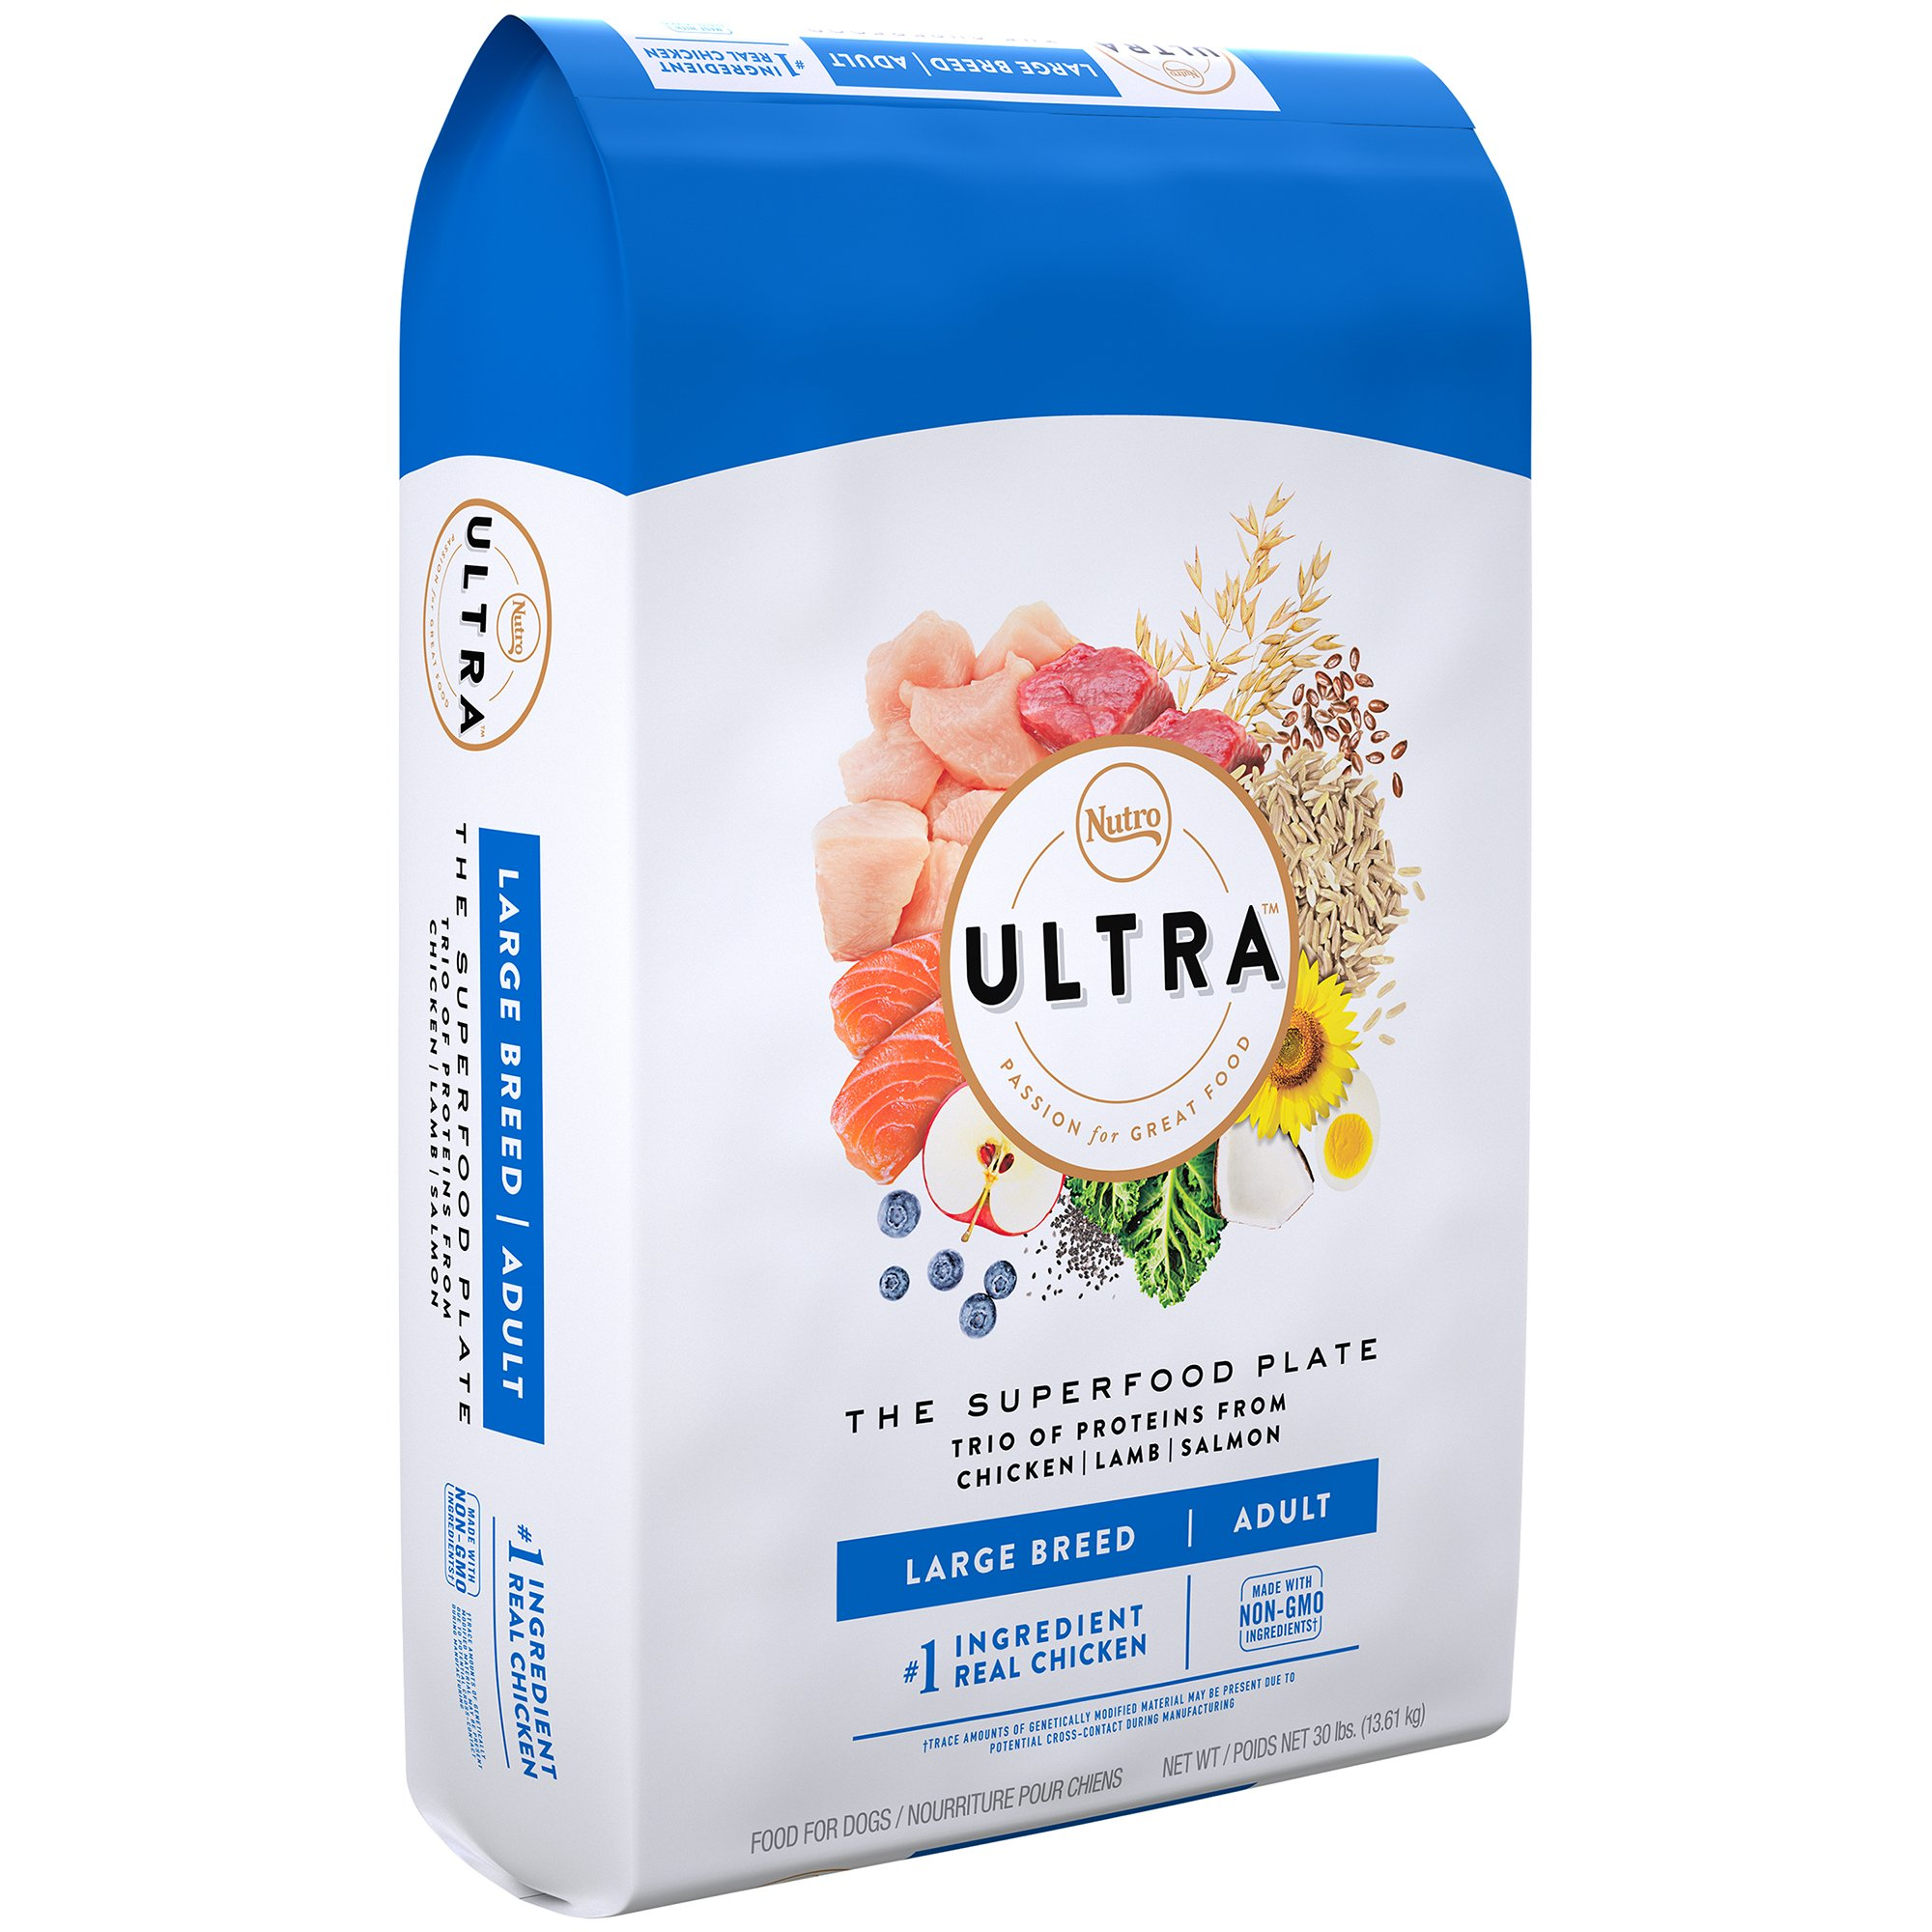 NUTRO ULTRA Large Breed Adult Dry Dog Food 30 Pounds | eBay